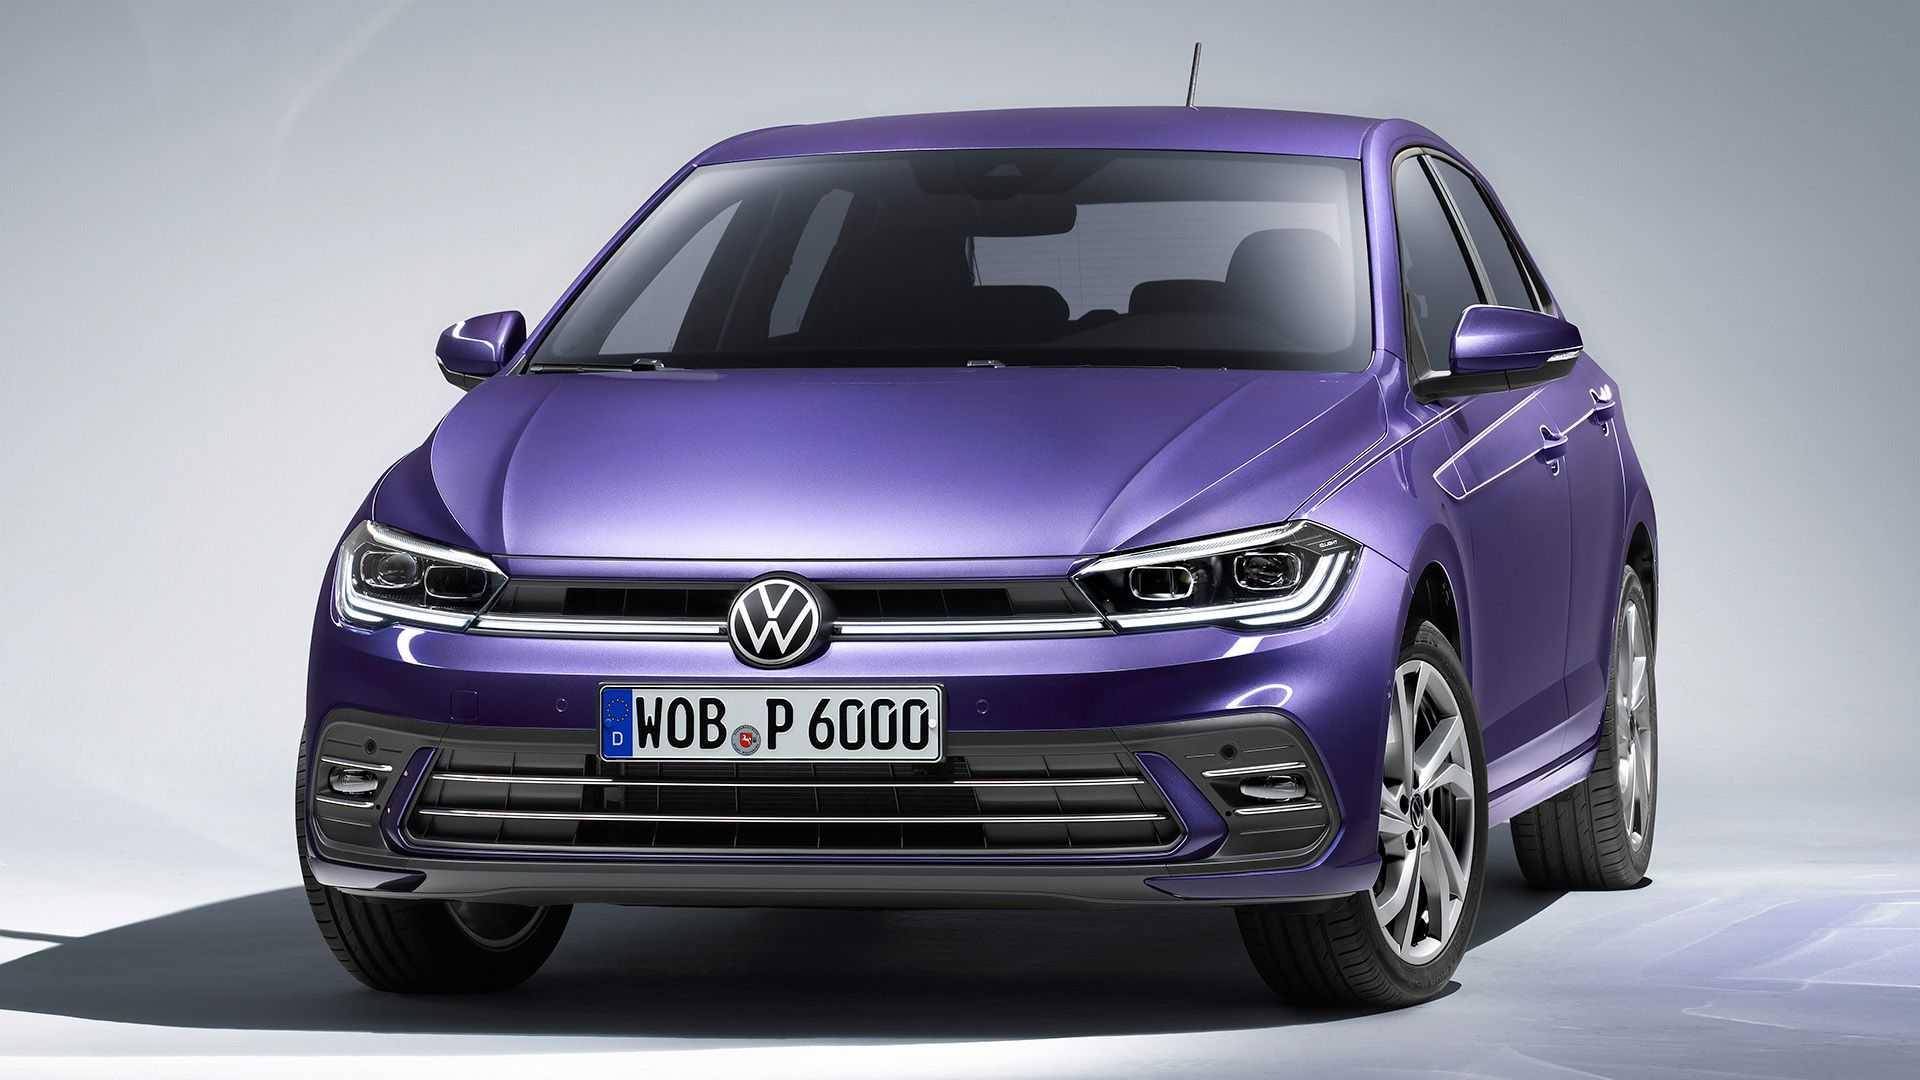 Volkswagen-Polo-facelift-31